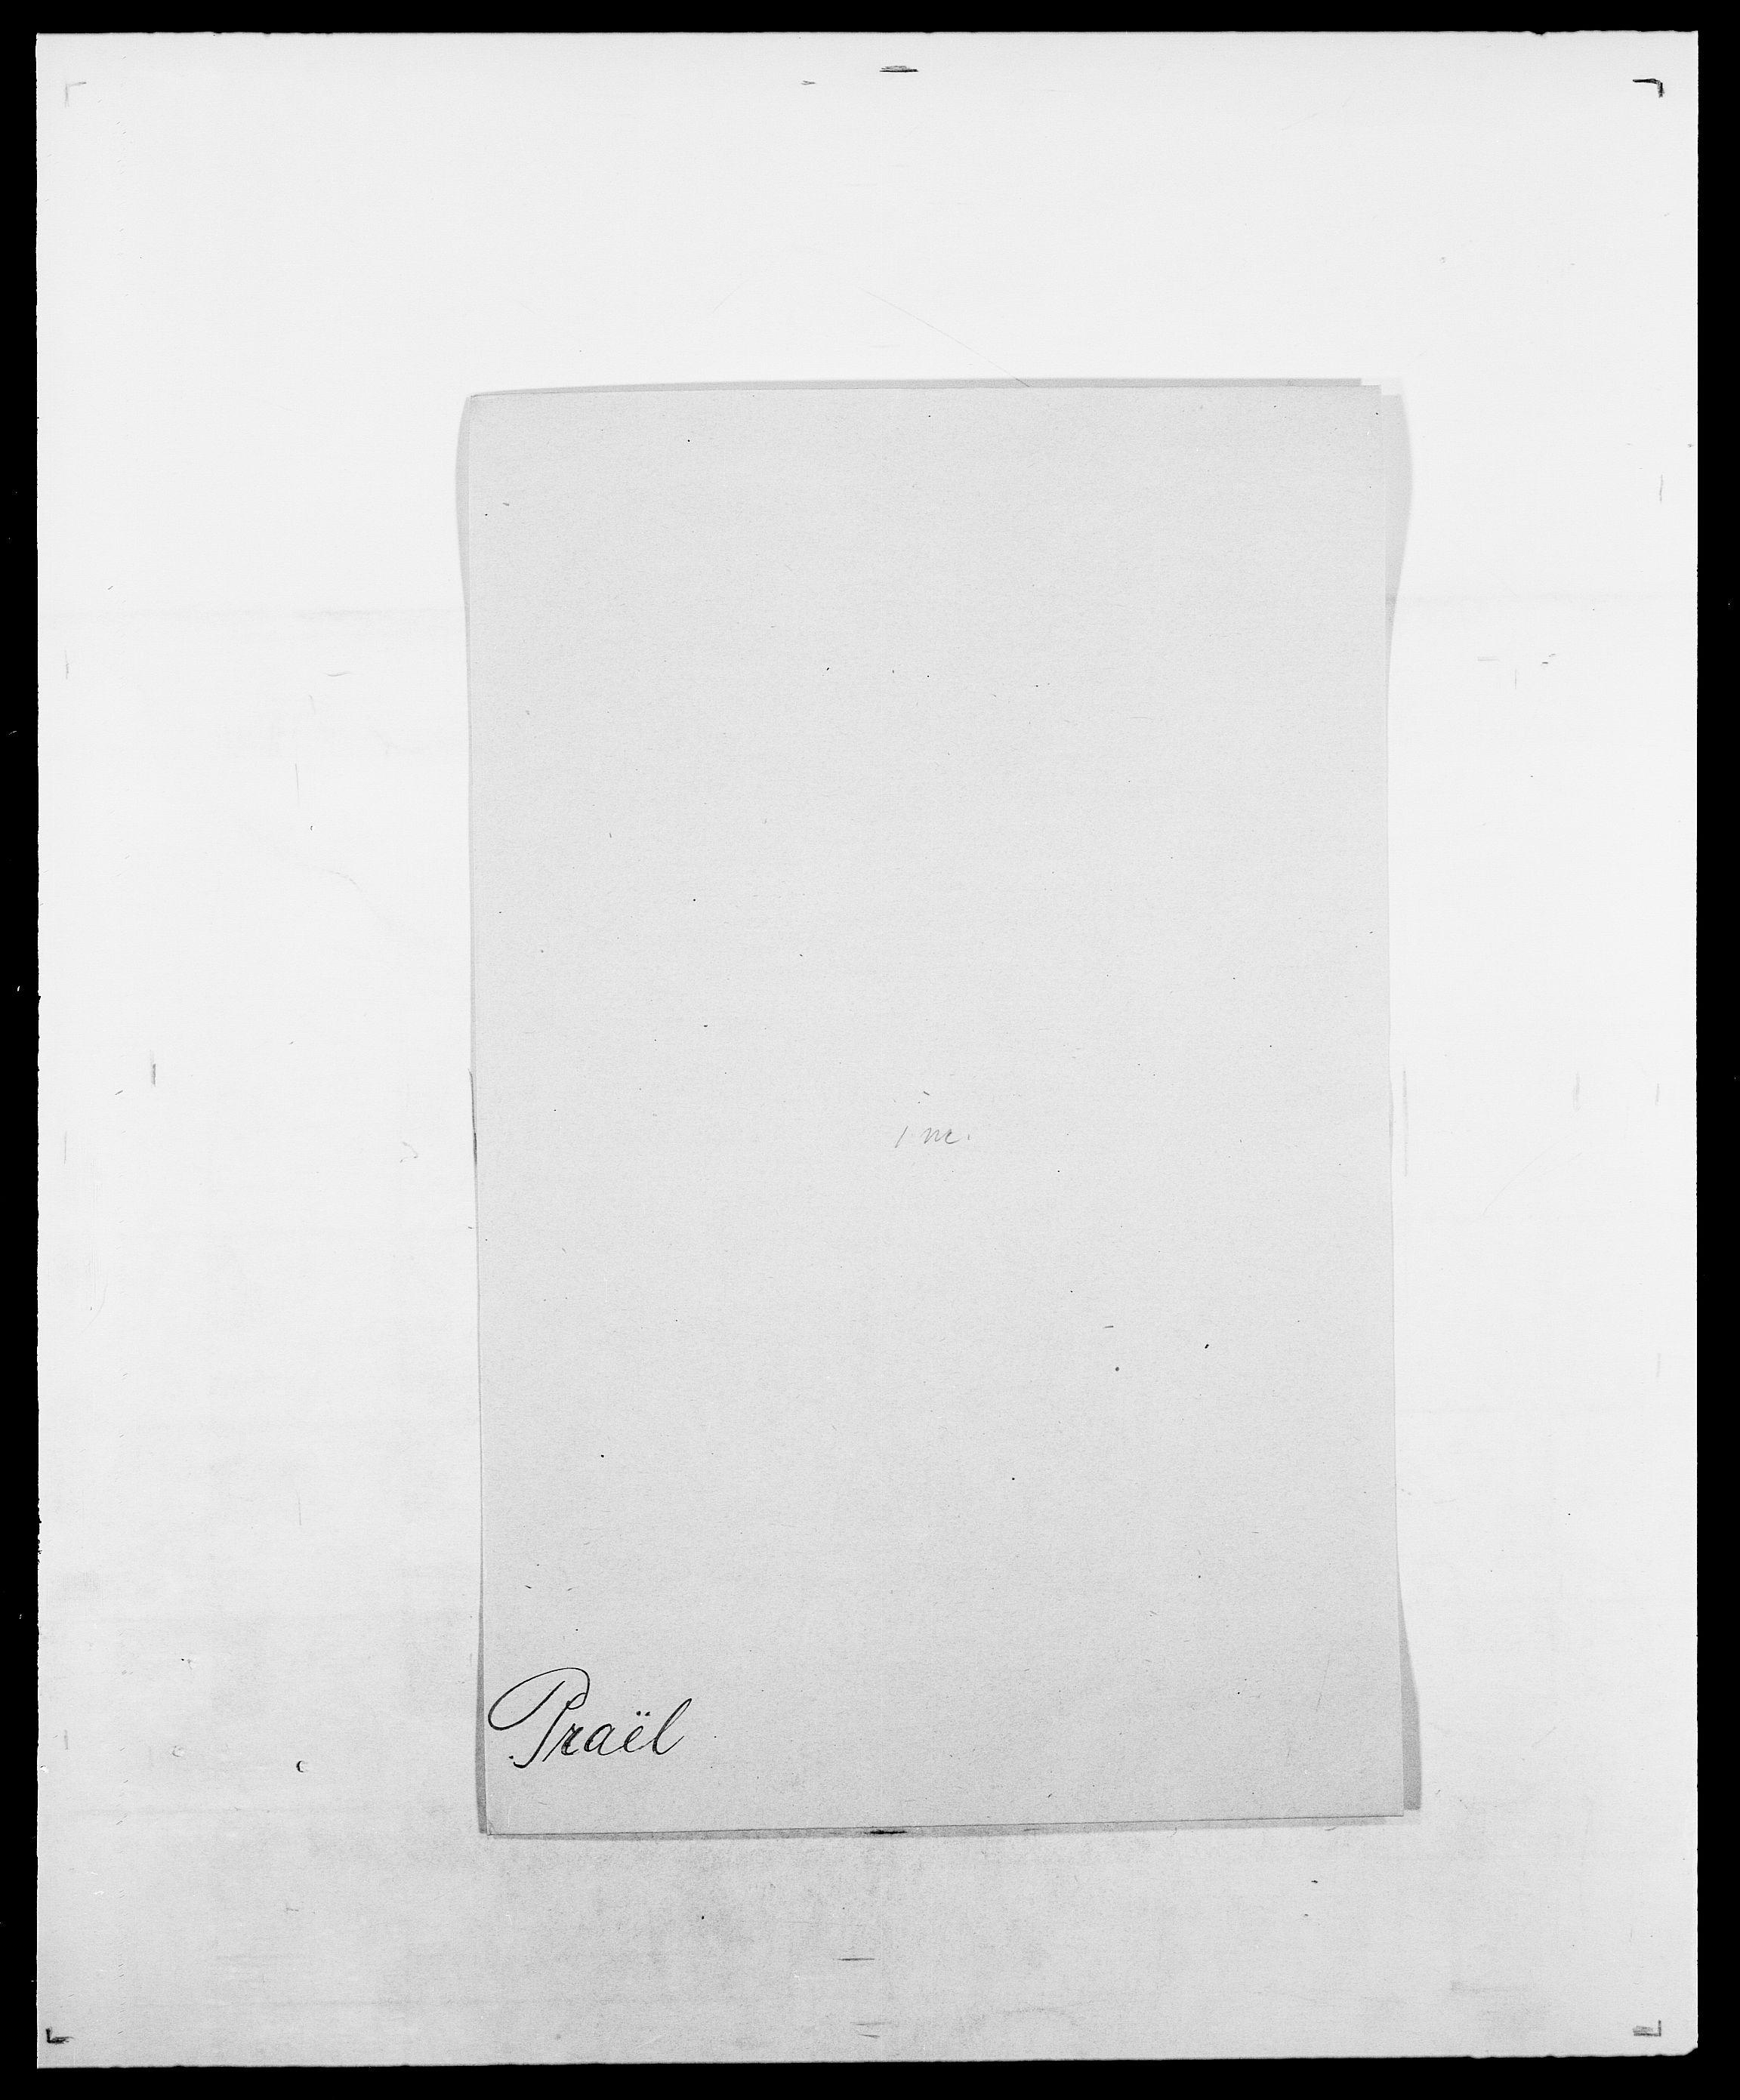 SAO, Delgobe, Charles Antoine - samling, D/Da/L0031: de Place - Raaum, s. 276